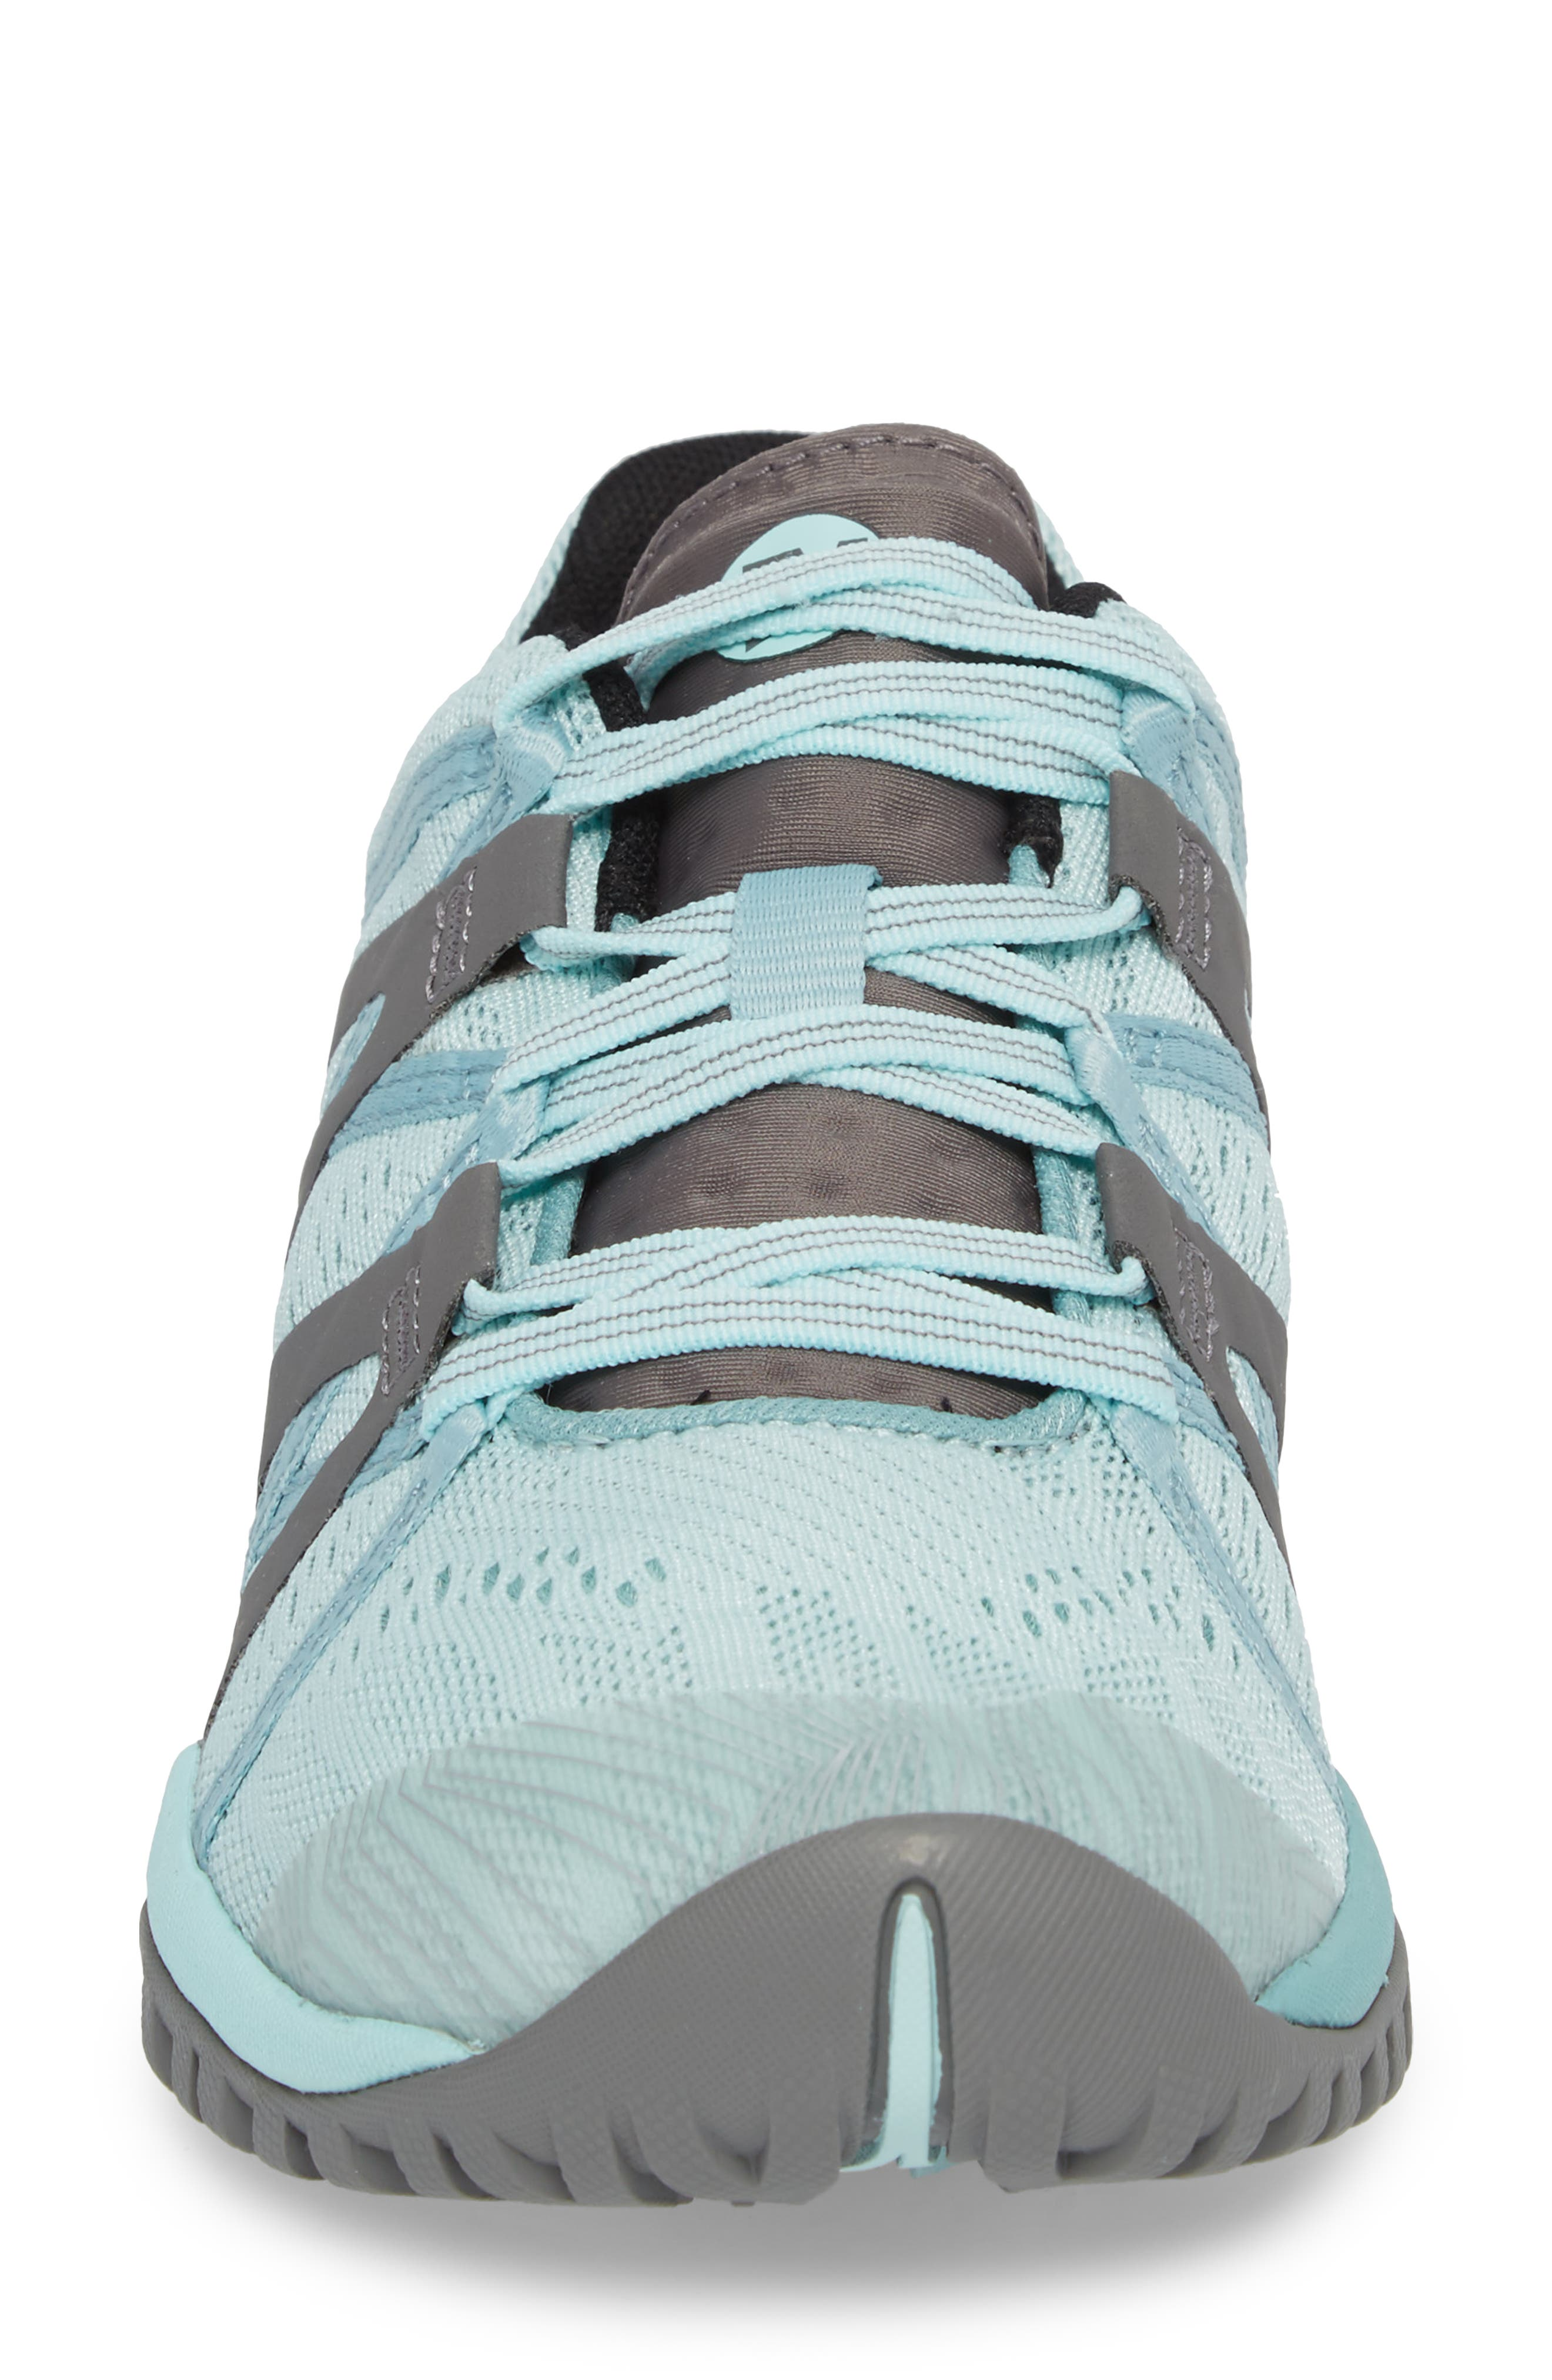 Siren Hex Sneaker,                             Alternate thumbnail 4, color,                             Bleached Aqua